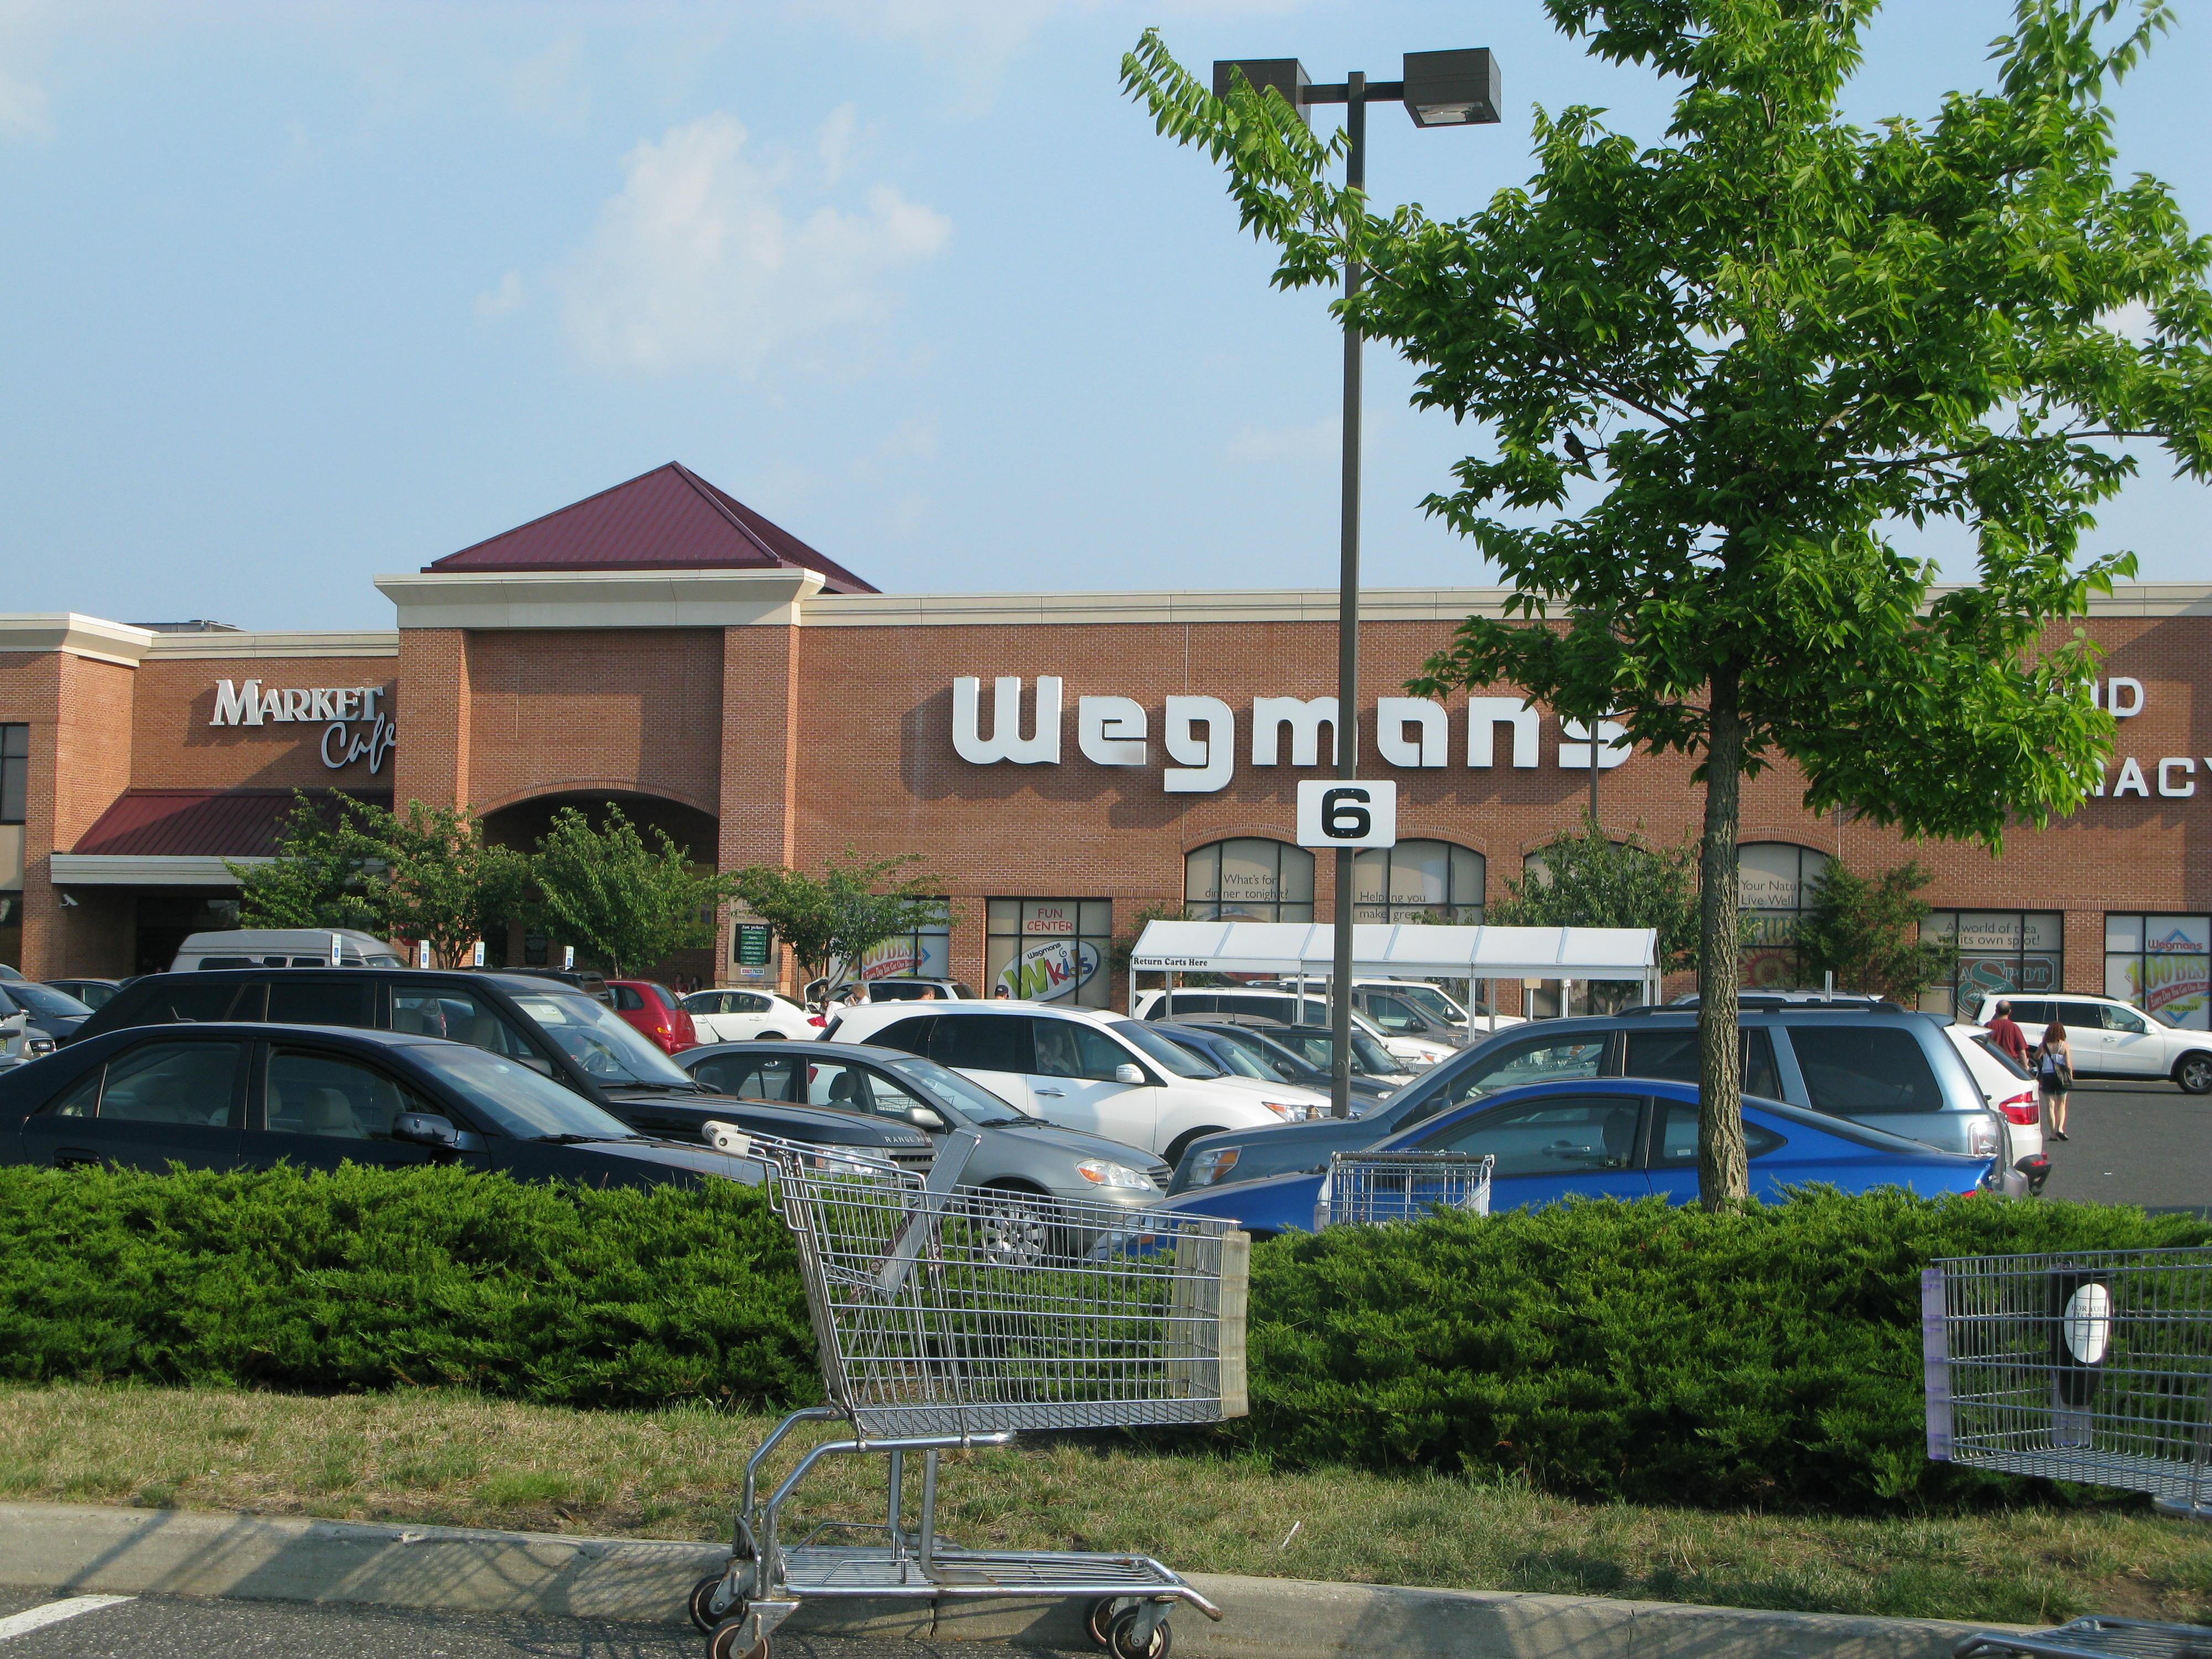 When And Where Will Wegman S In Virginia Beach Be Open